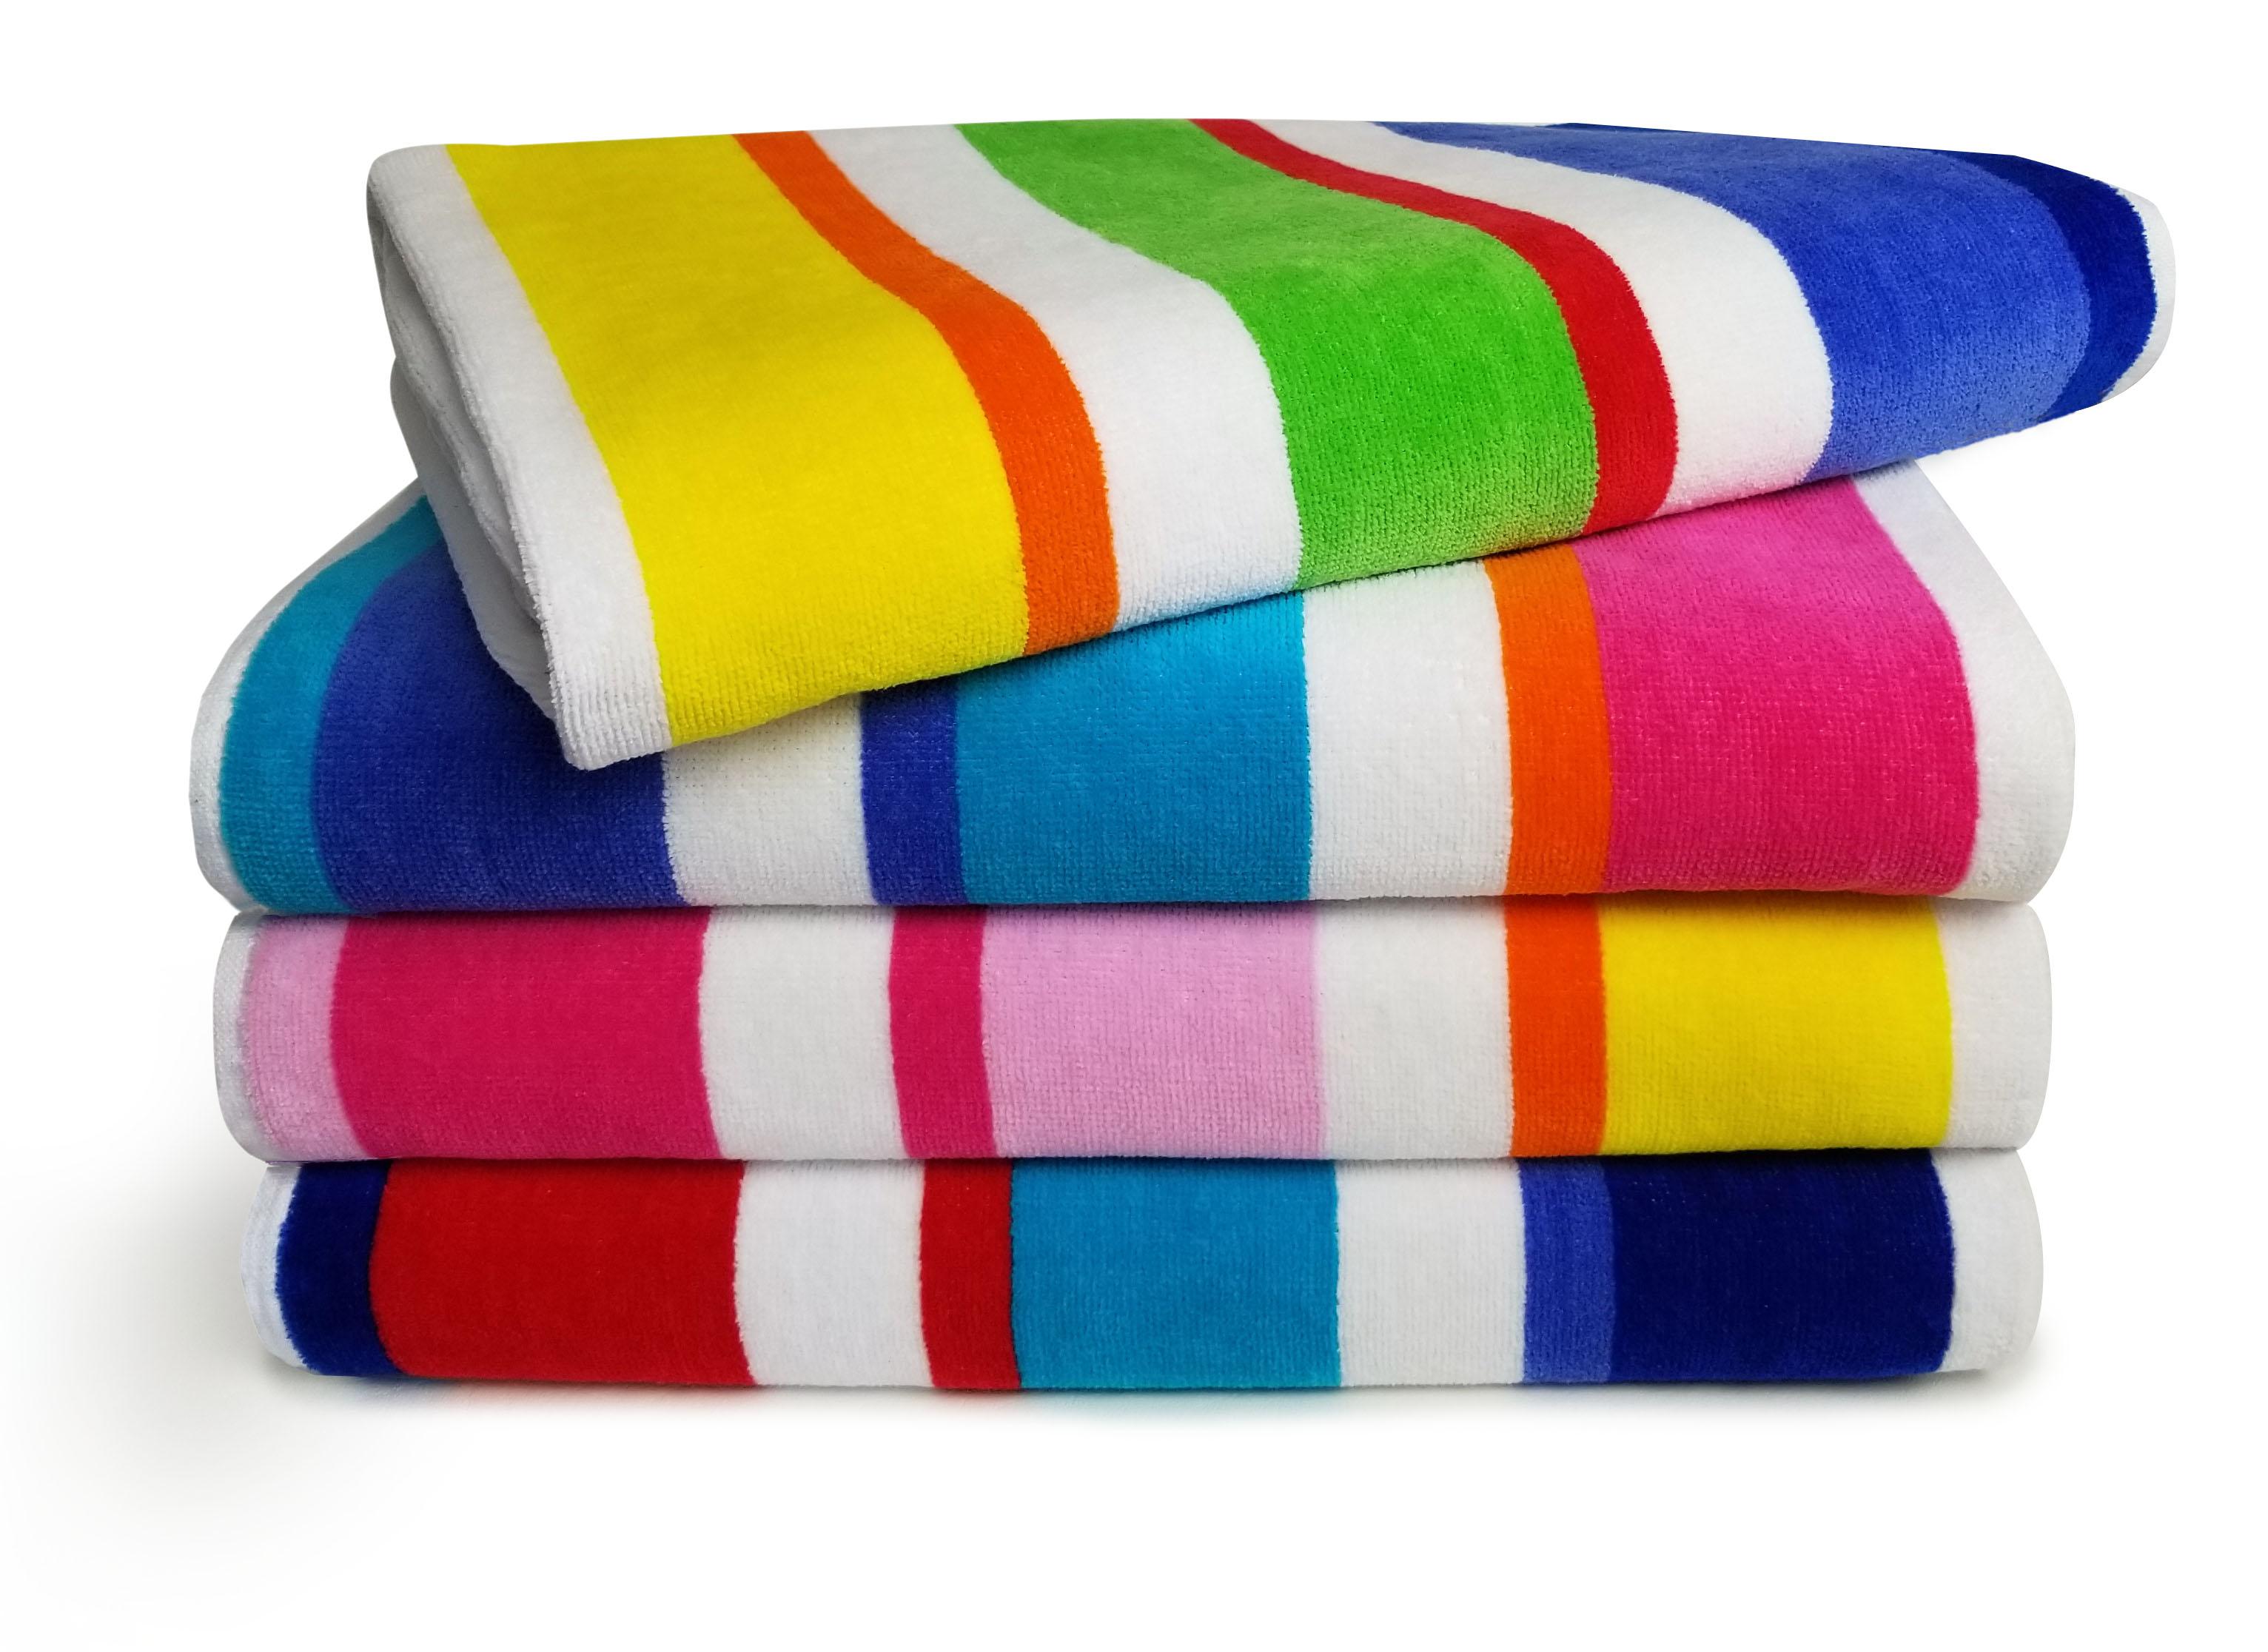 32x63 Terry Beach Towels Cotton Velour Maya Island Joy-Exclusive Multicolor, Cabana Stripe Beach & Pool Towel 14 lbs per doz, 100% Cotton.